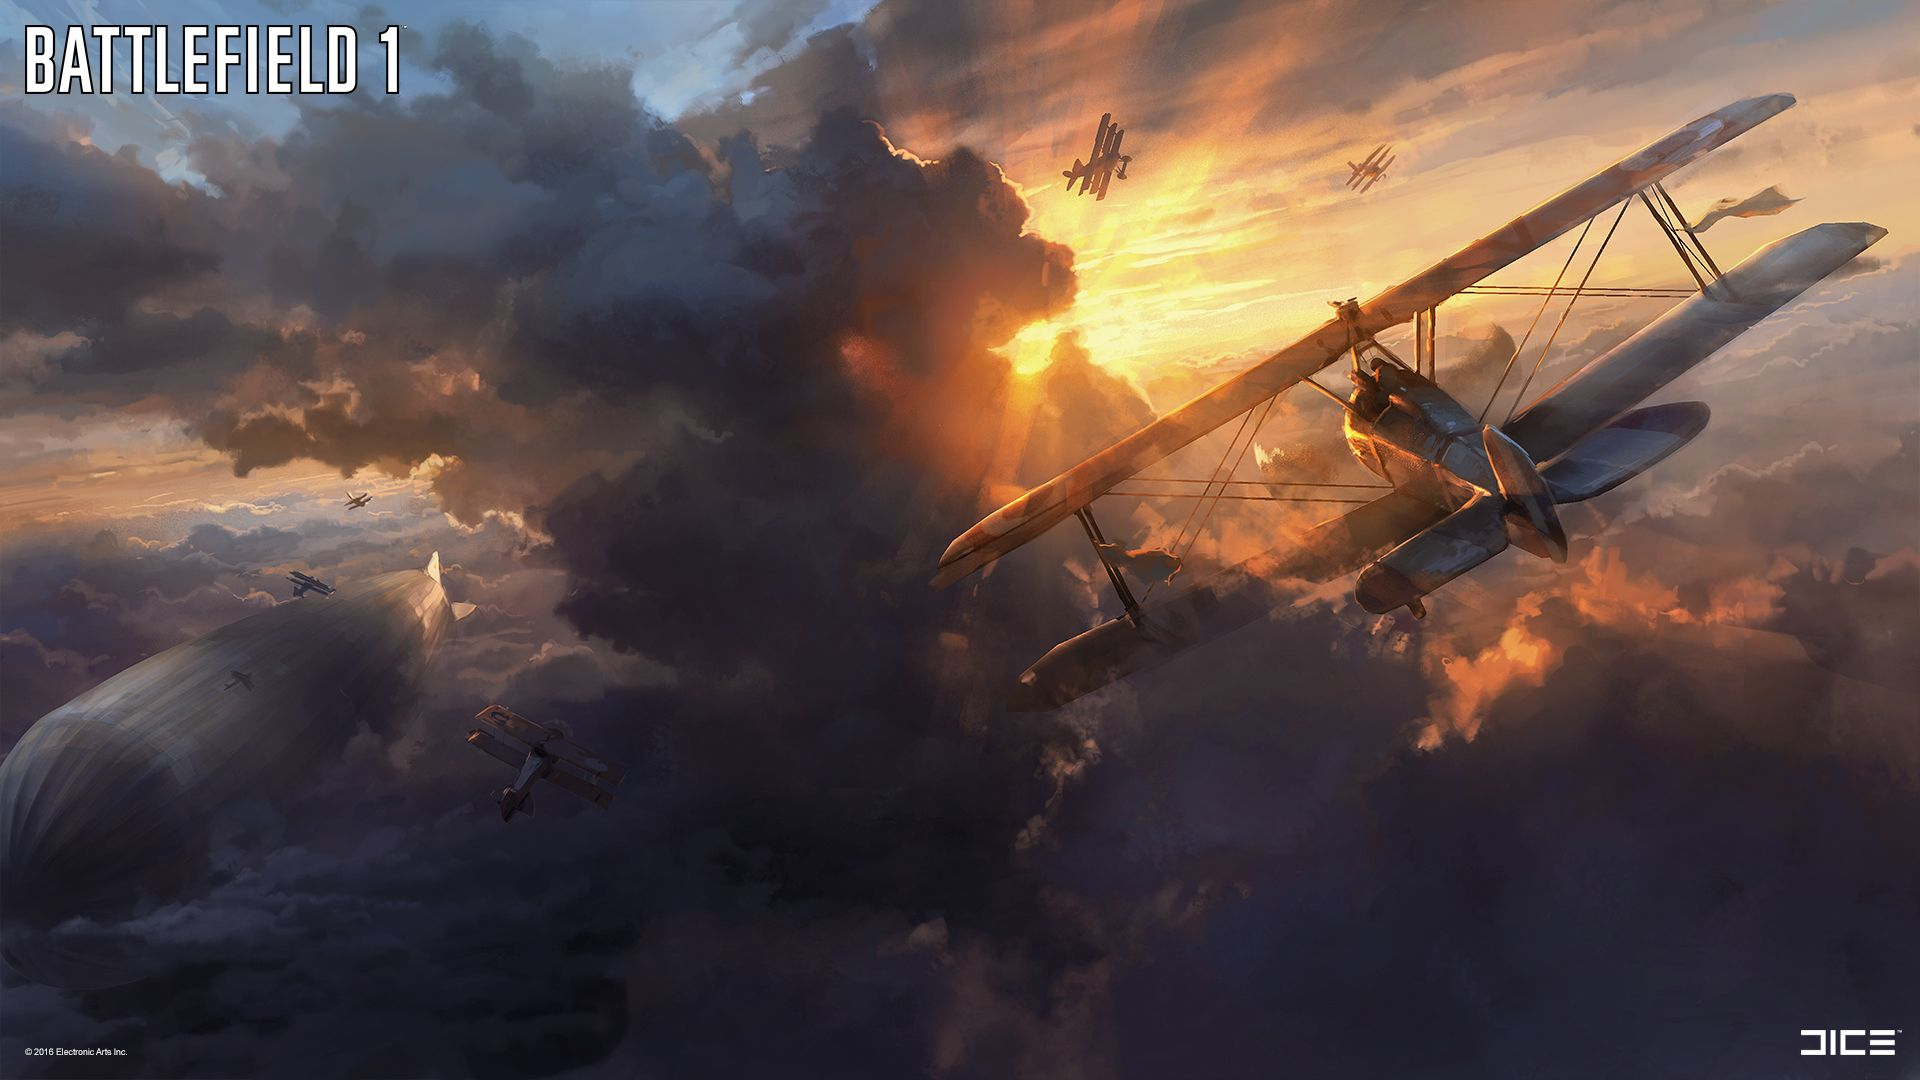 b3596418404de420c3304670b494b932 - How To Get In A Plane In Battlefield 1